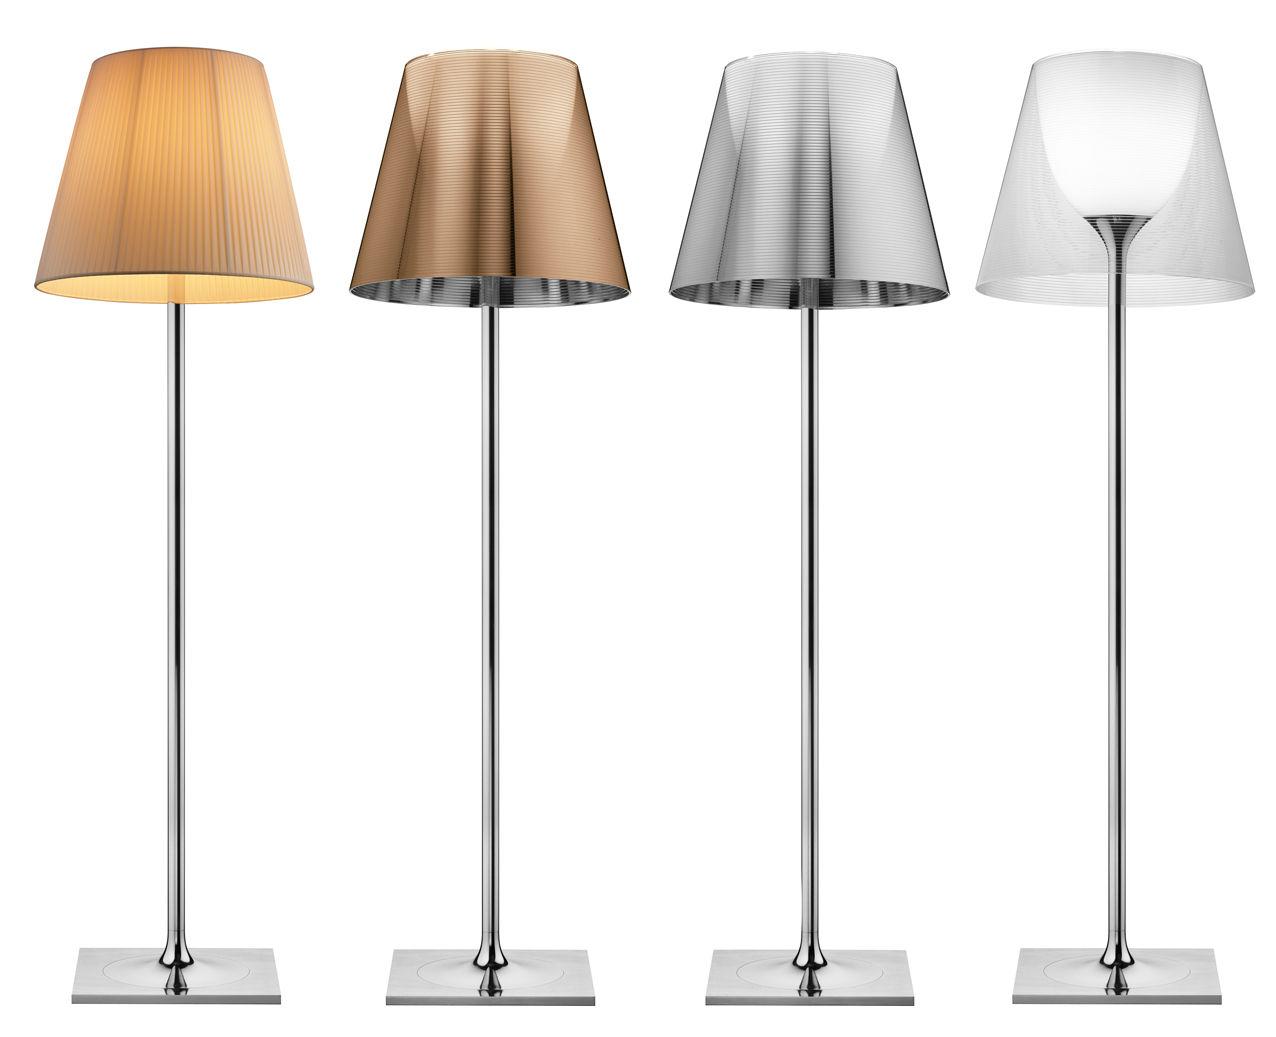 lampadaire k tribe f3 h 183 cm transparent flos. Black Bedroom Furniture Sets. Home Design Ideas